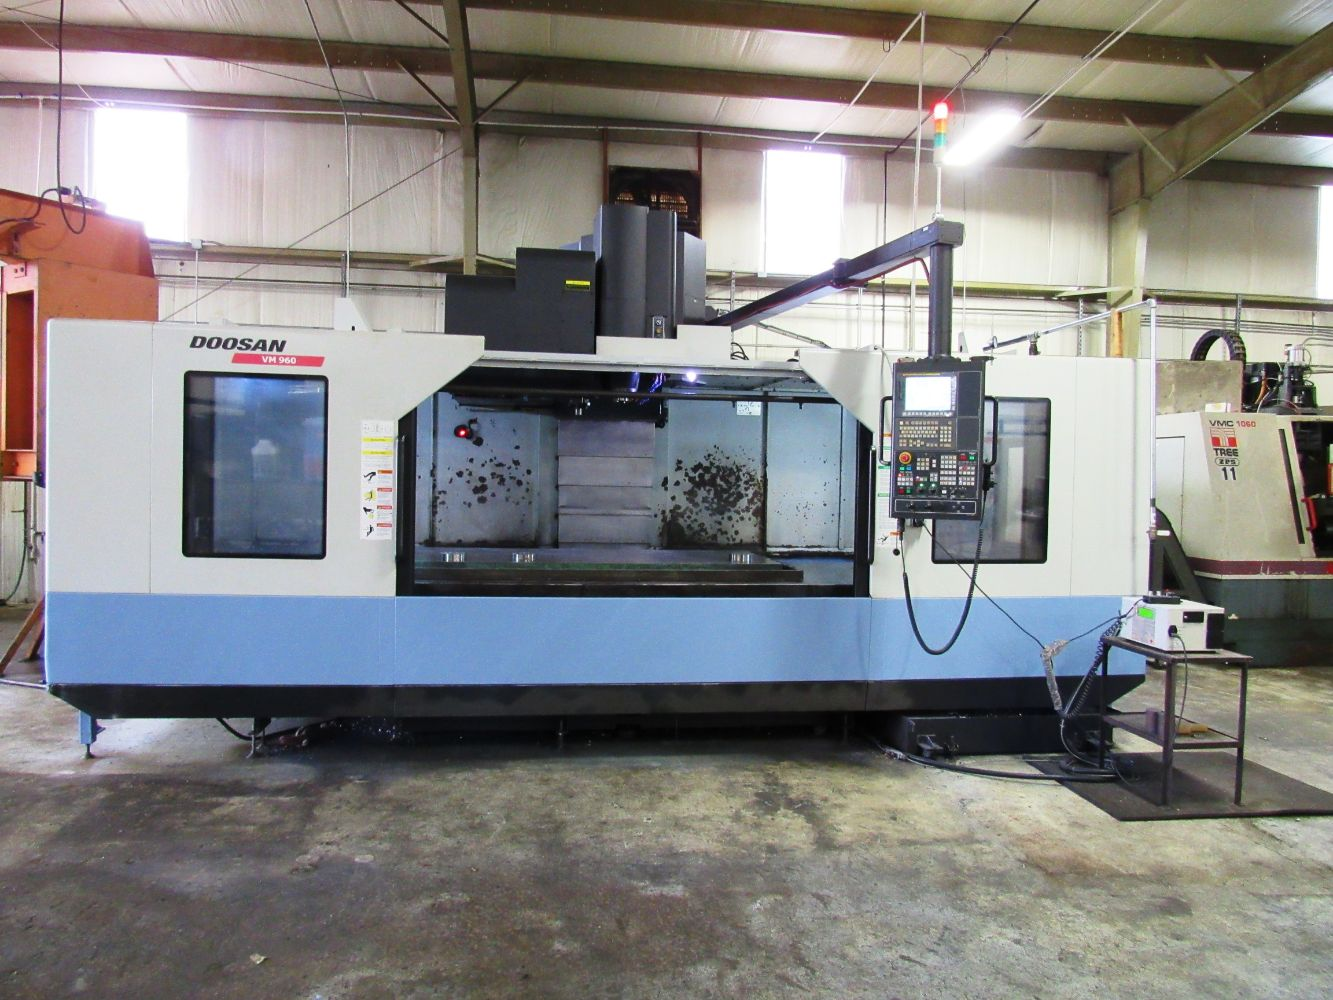 RCF ENTERPRISES - Doosan & CNC Machine Shop